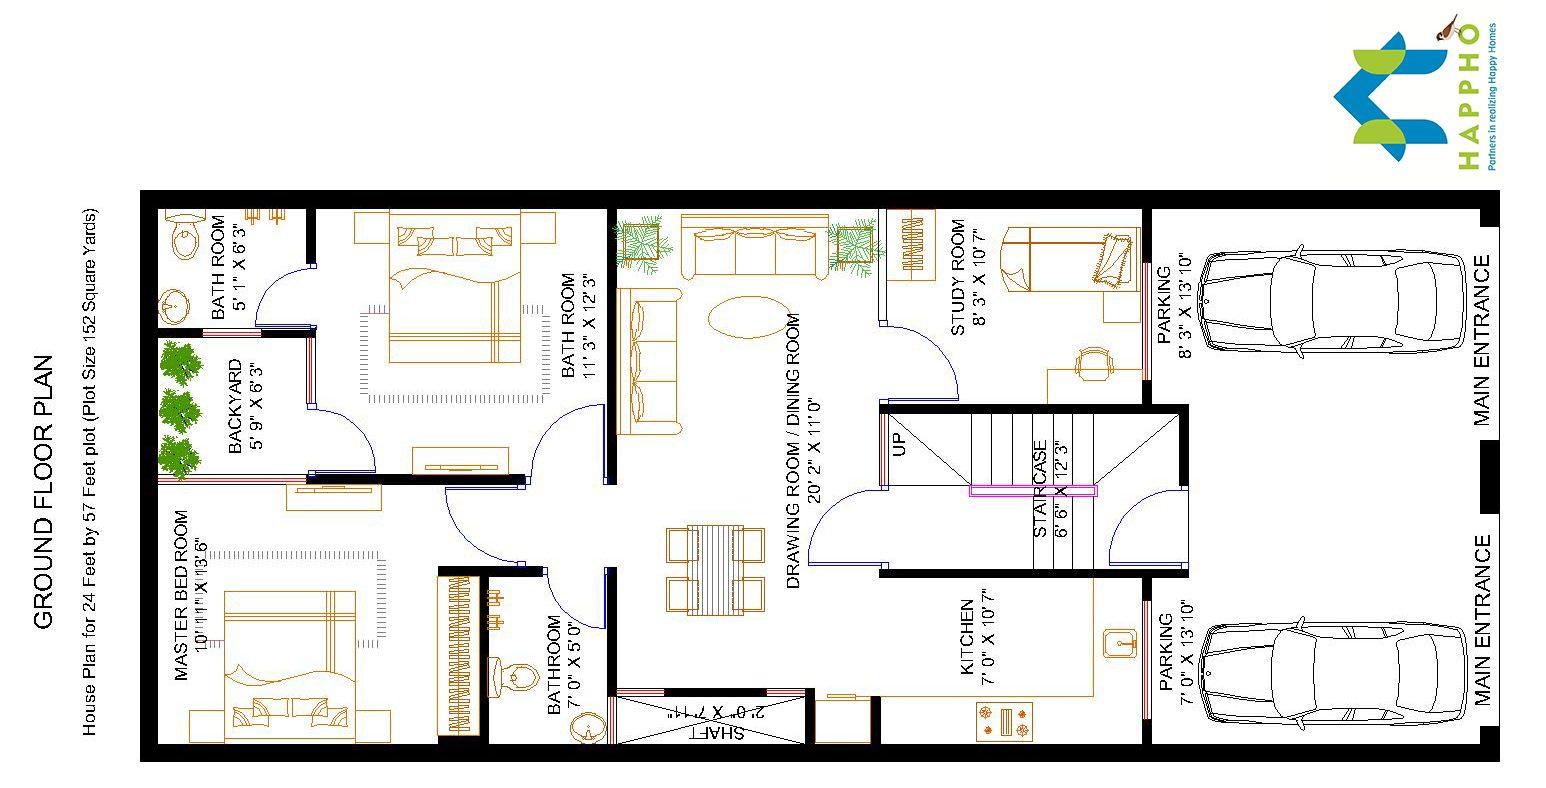 2 Bhk Floor Plan For 24 X 57 Feet Plot 1368 Square Feet